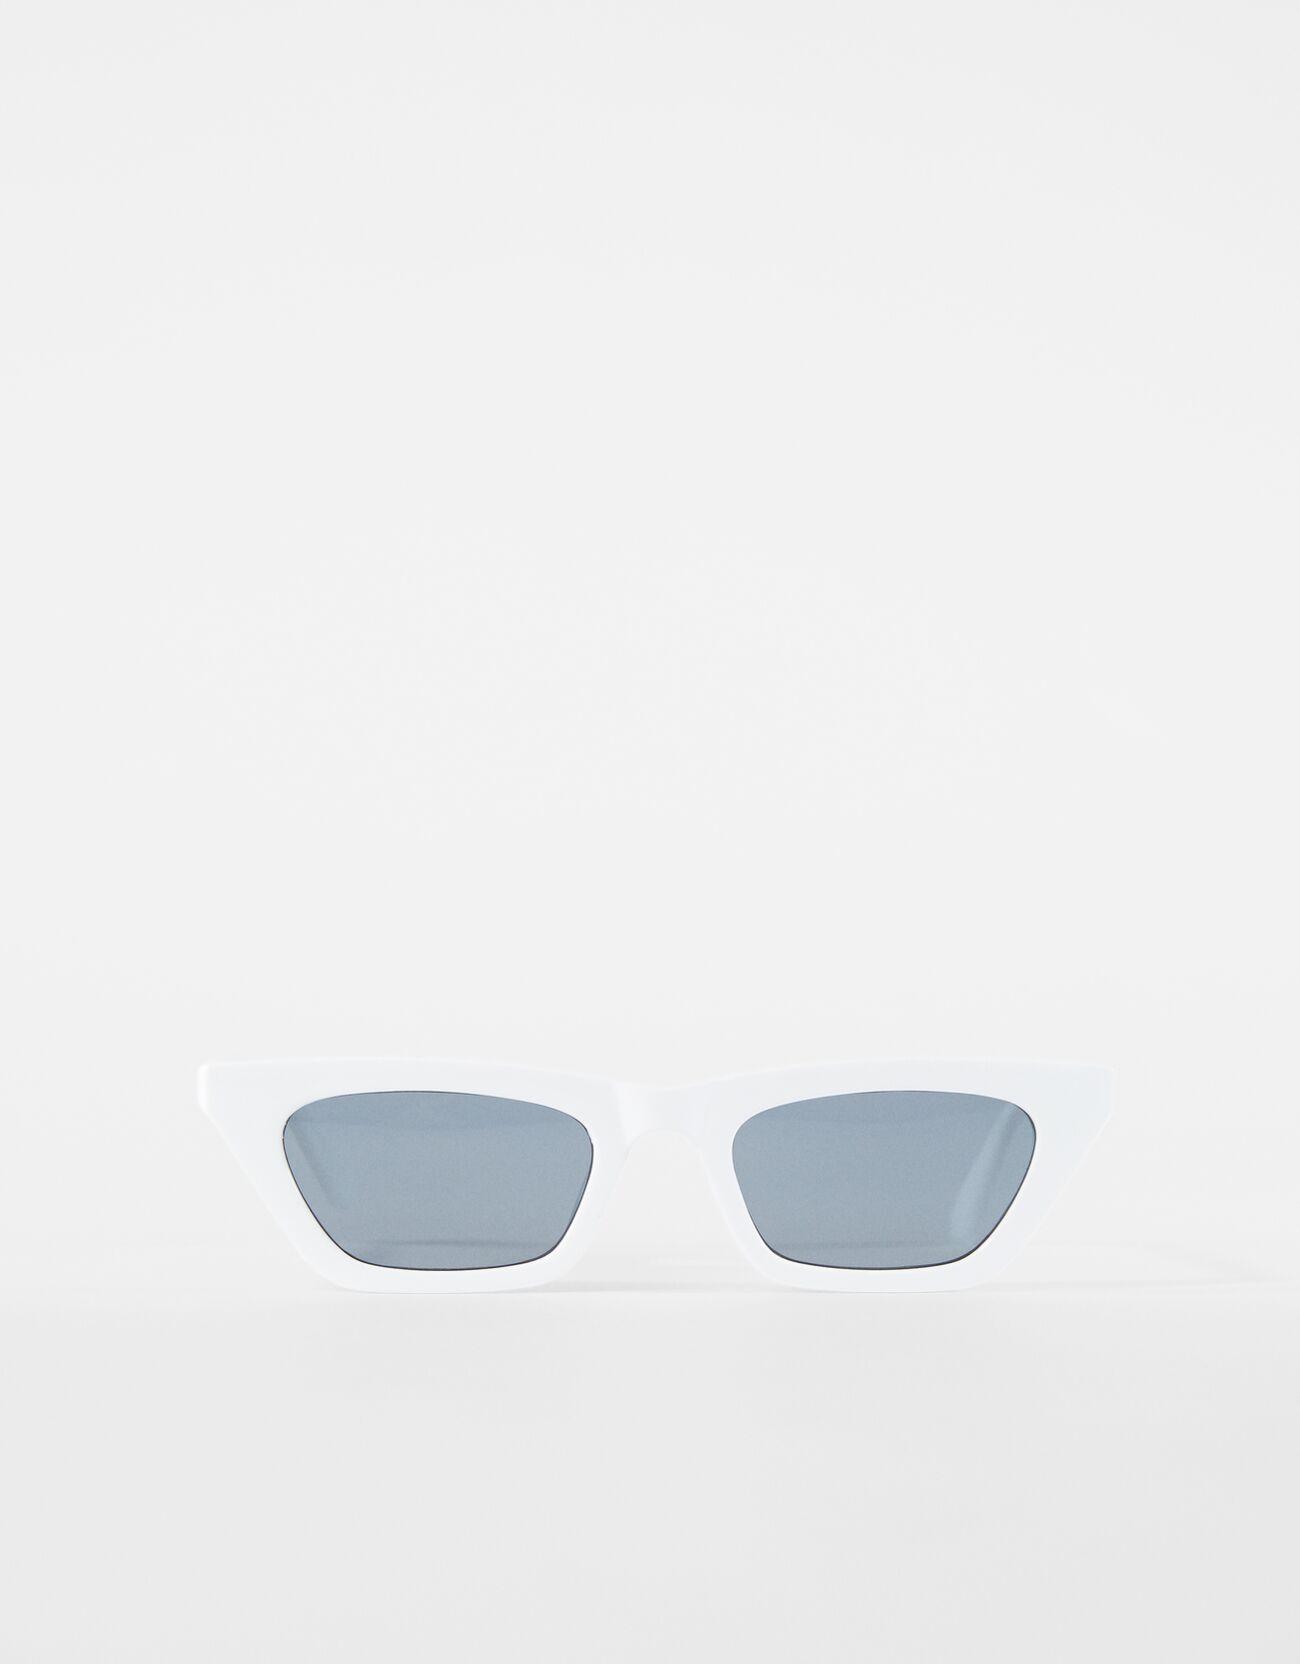 Cat eye sunglasses.